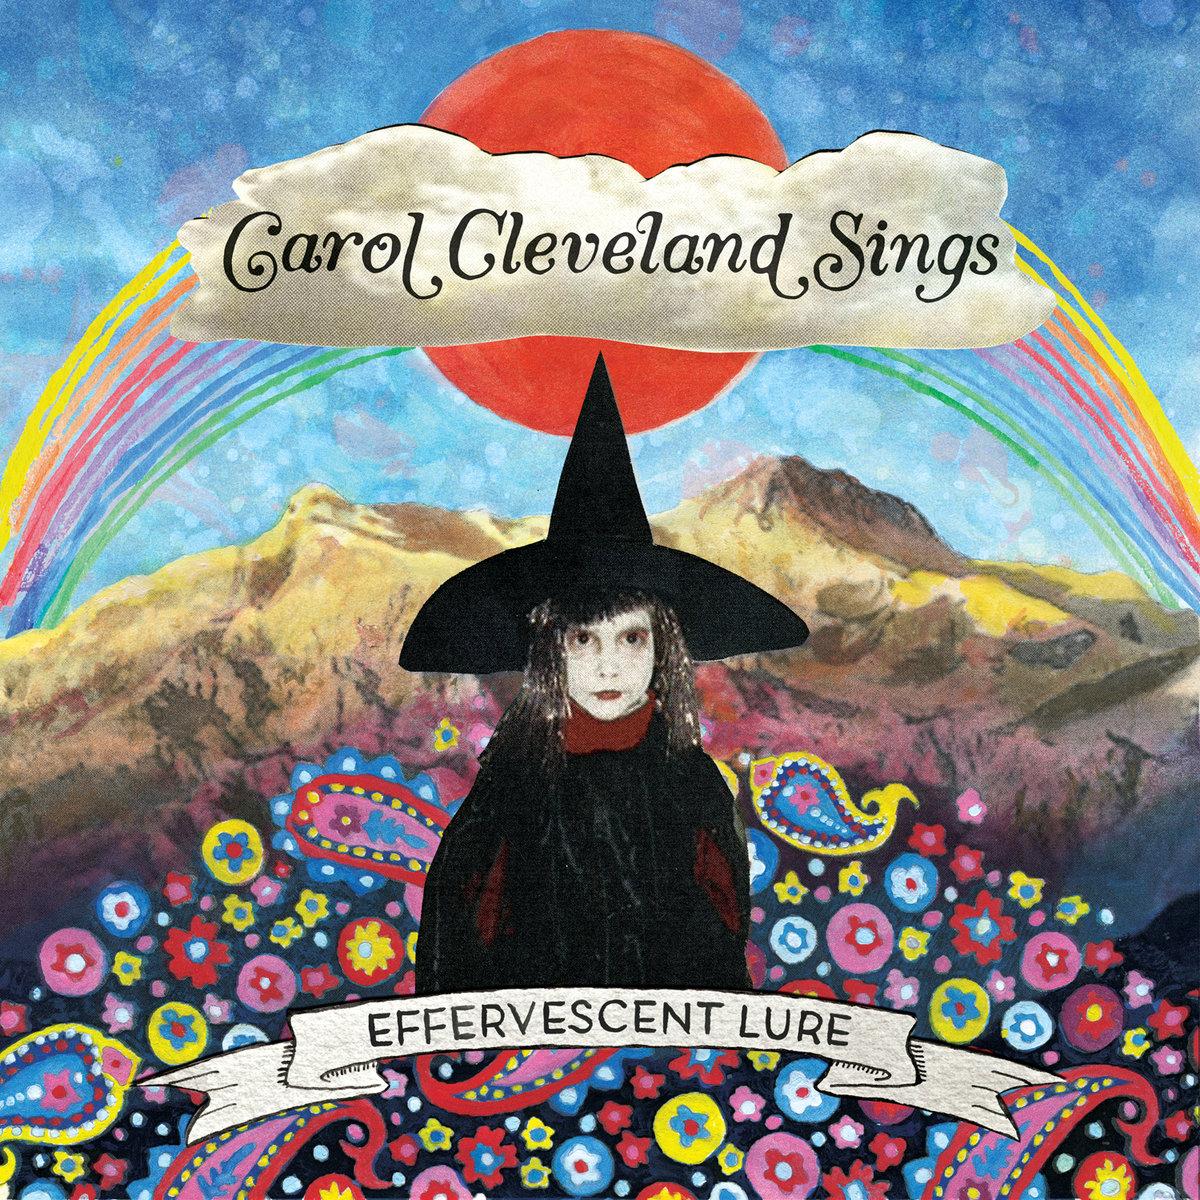 Carol Cleveland Sings